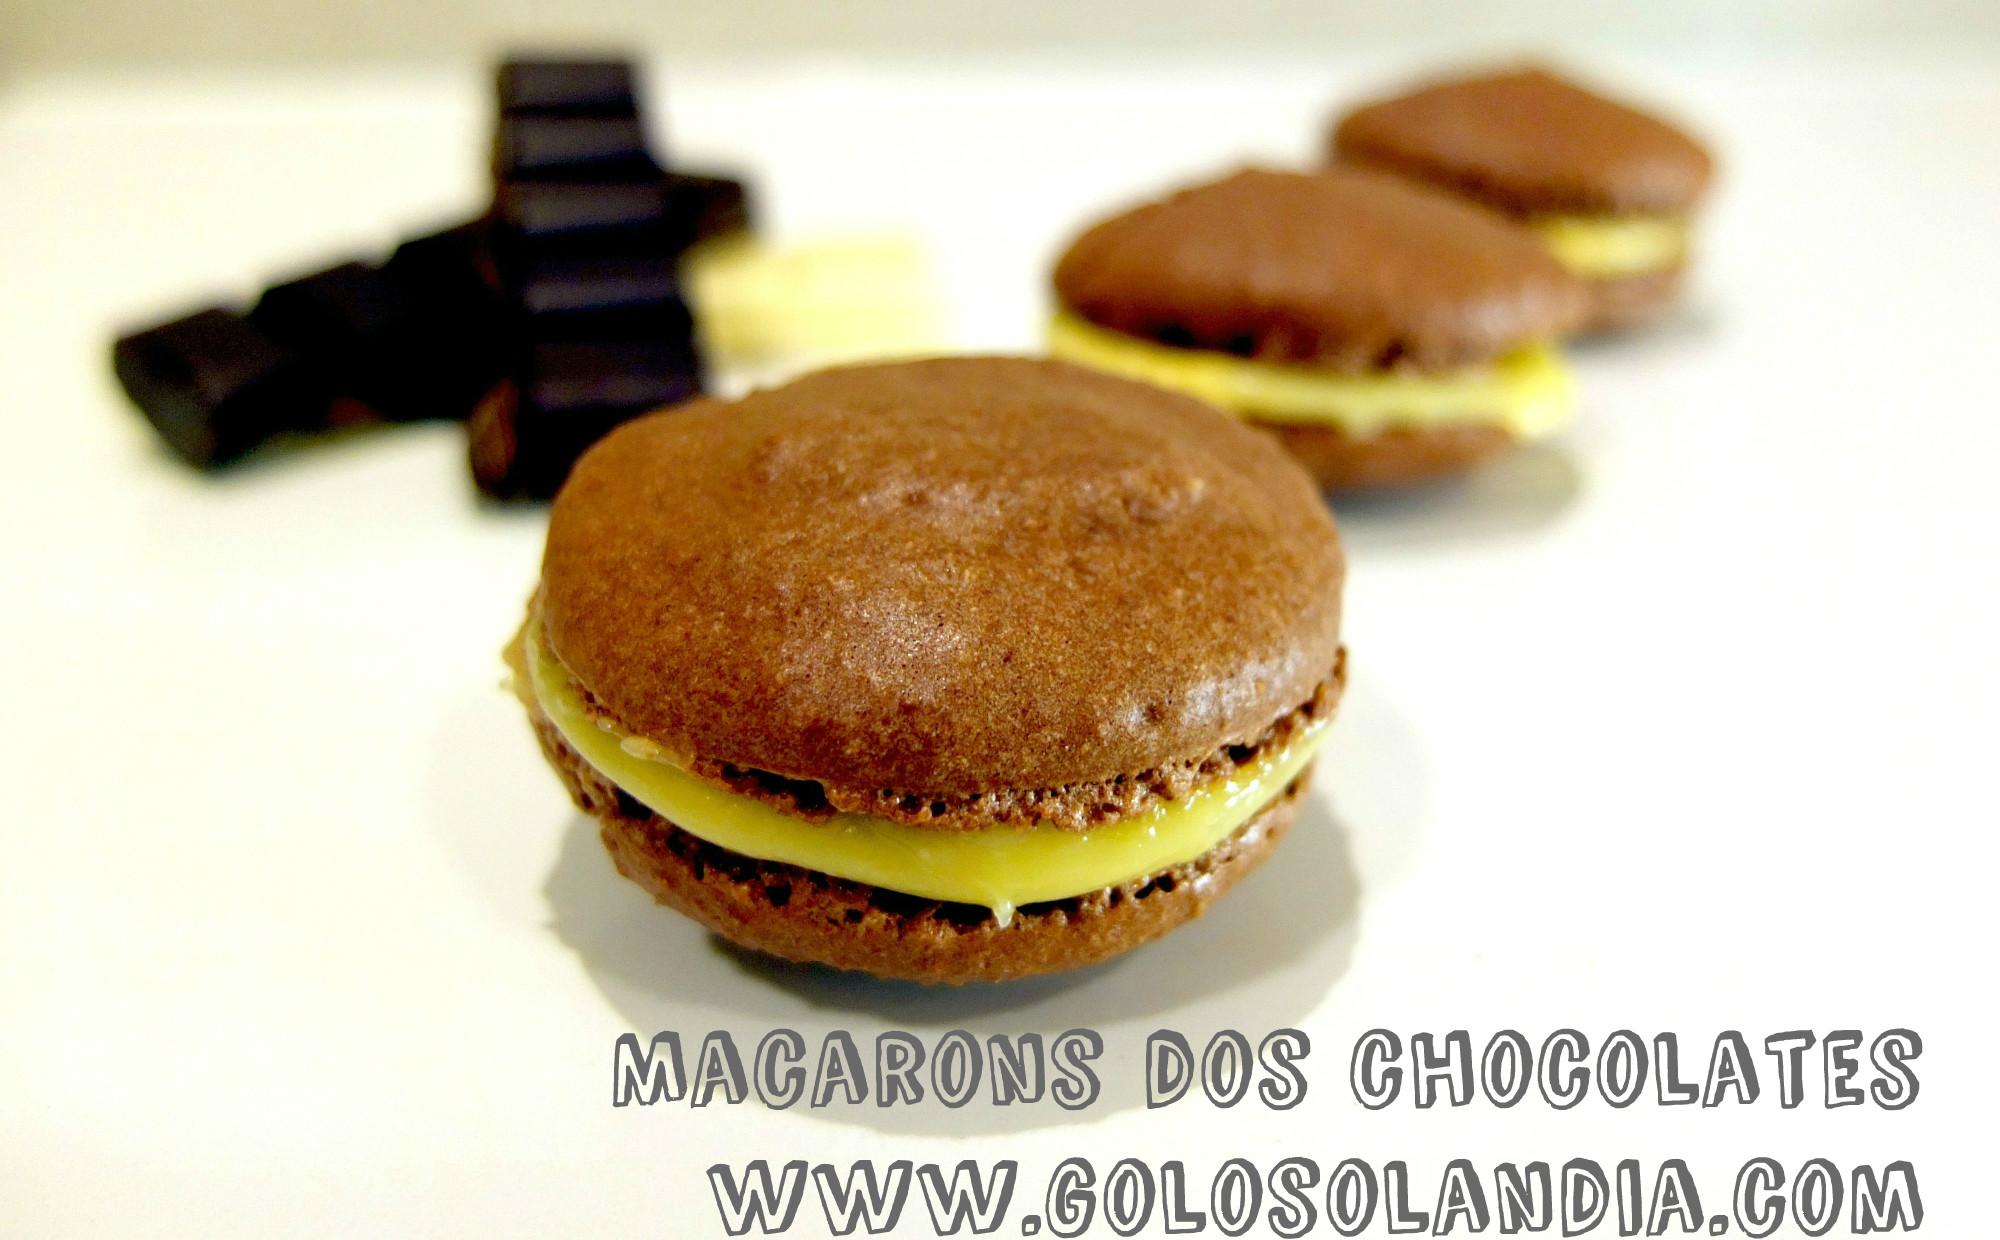 Macarons dos chocolates